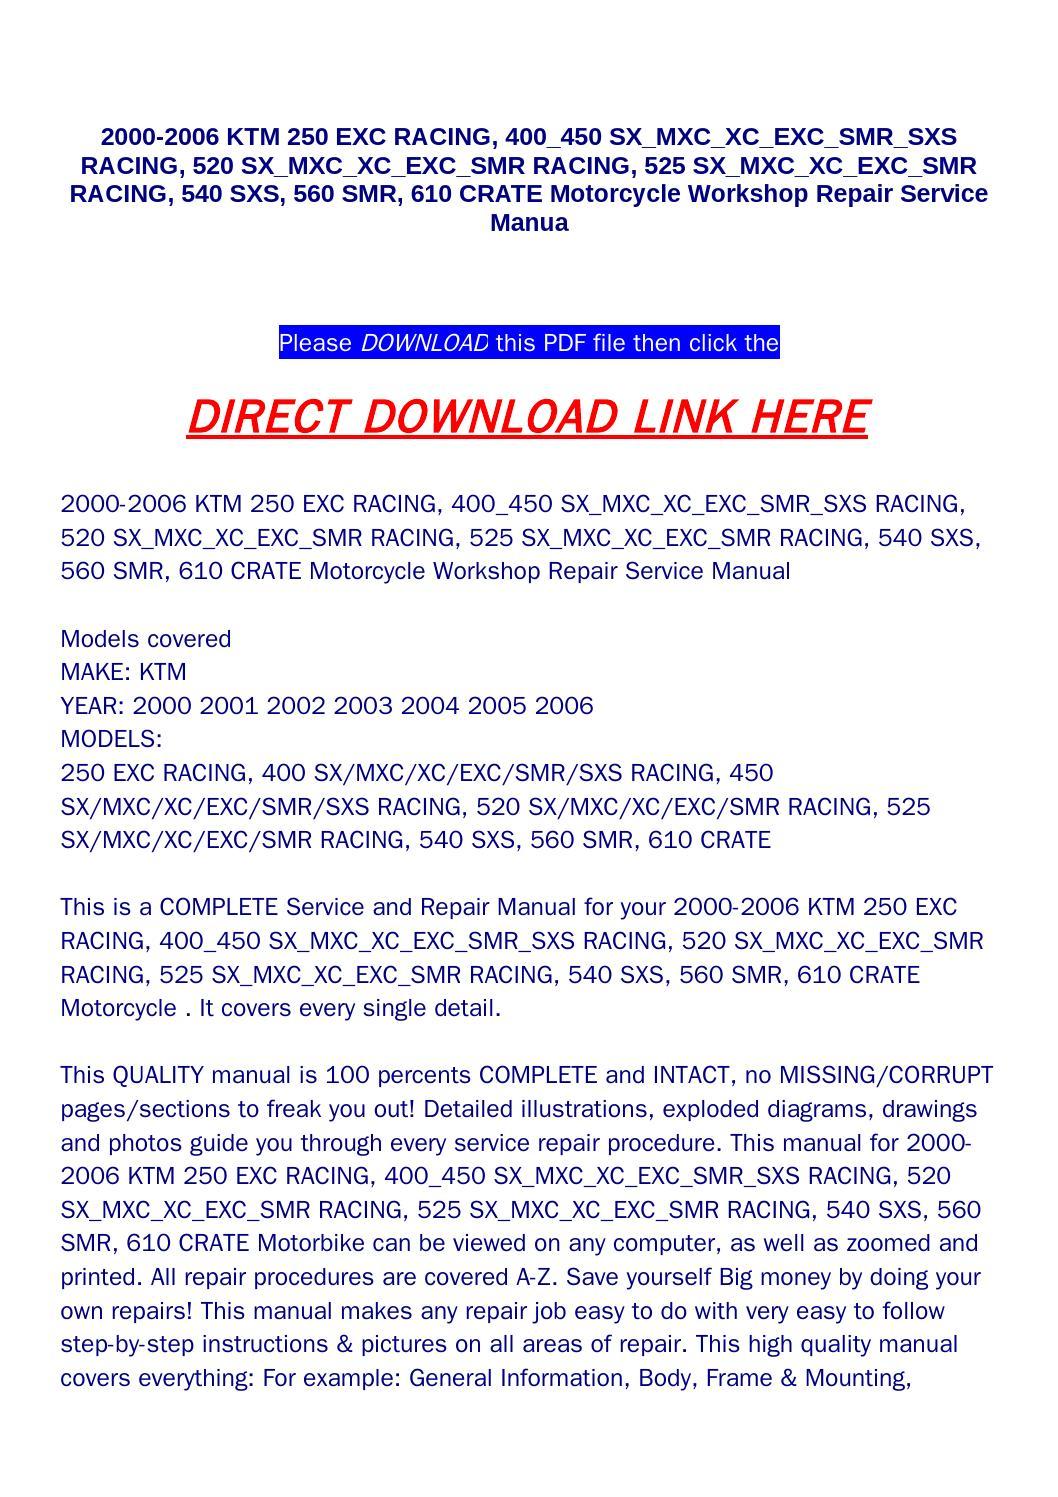 2000 2006 ktm 250 exc racing, 400 450 sx mxc xc exc smr sxs racing, 520 sx  mxc xc exc smr racing, 52 by food - issuu